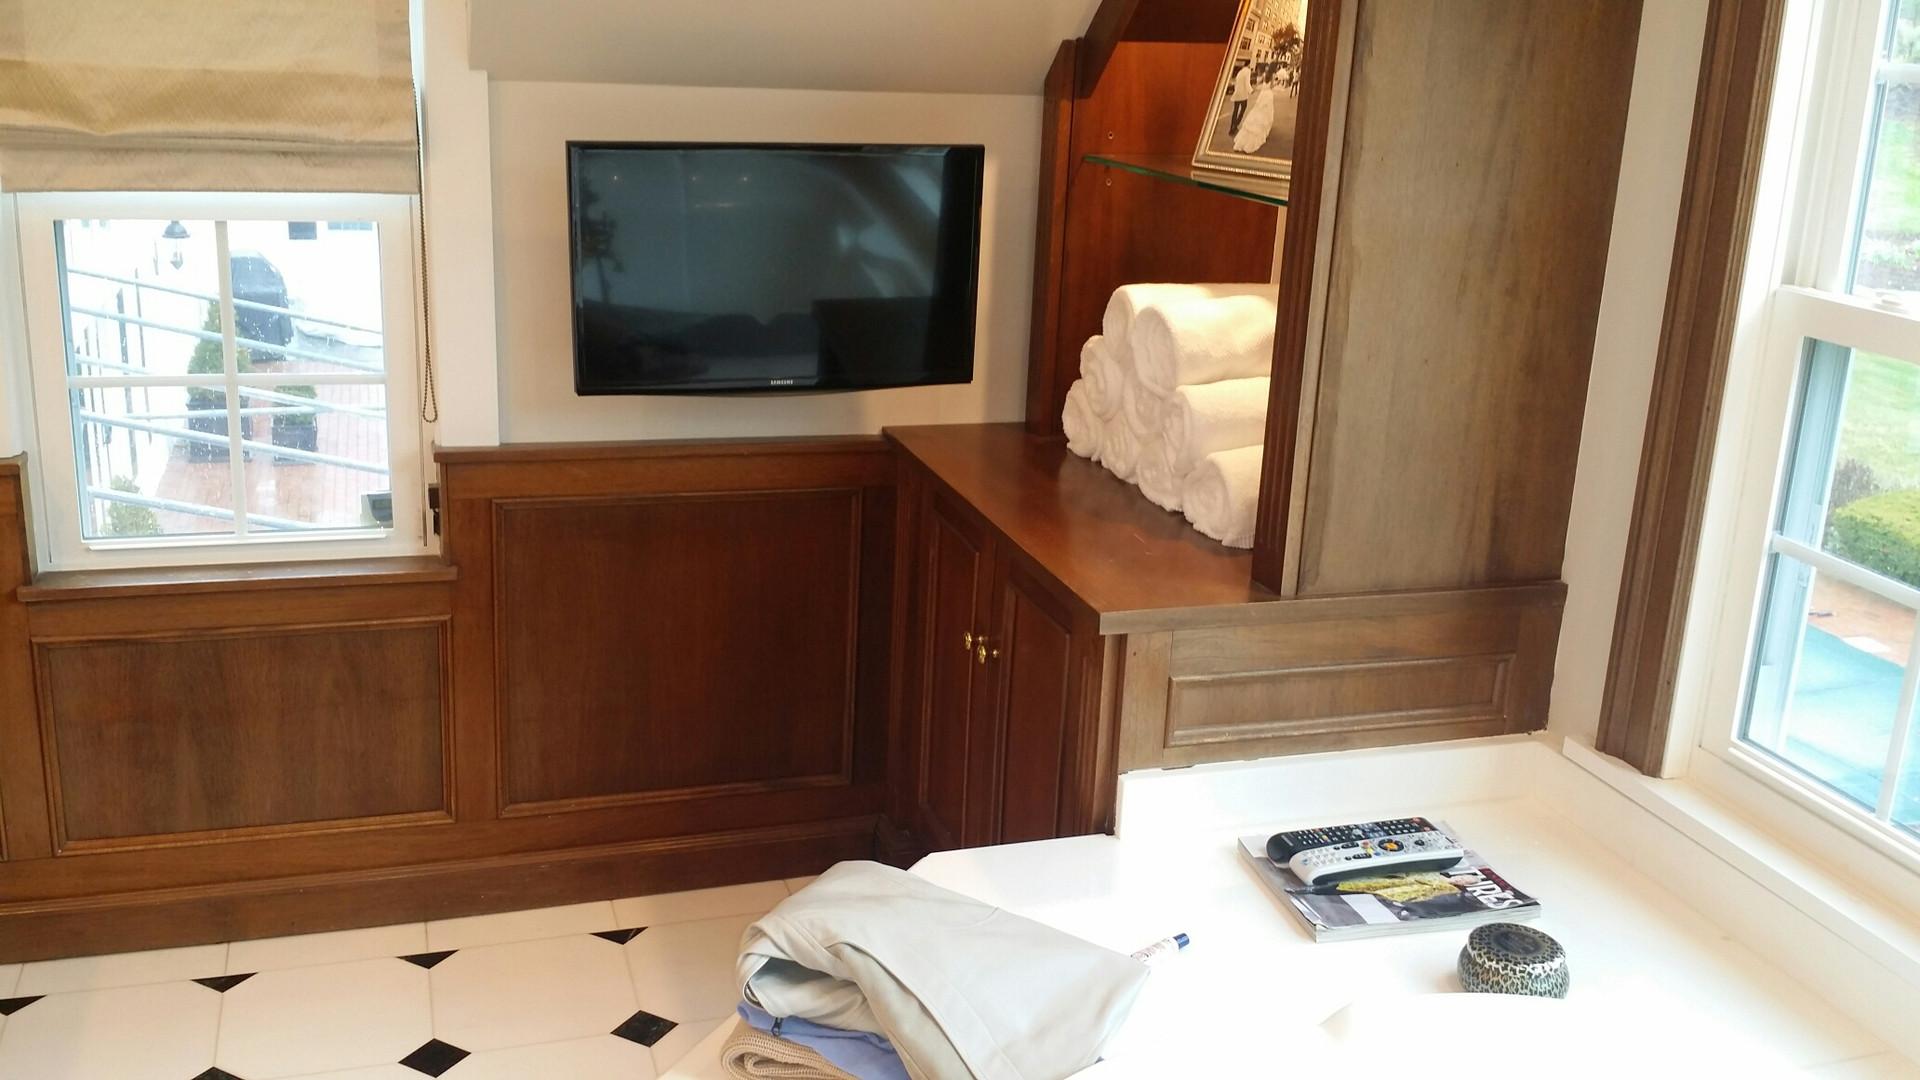 We put TVs everywhere, even the bathroom!